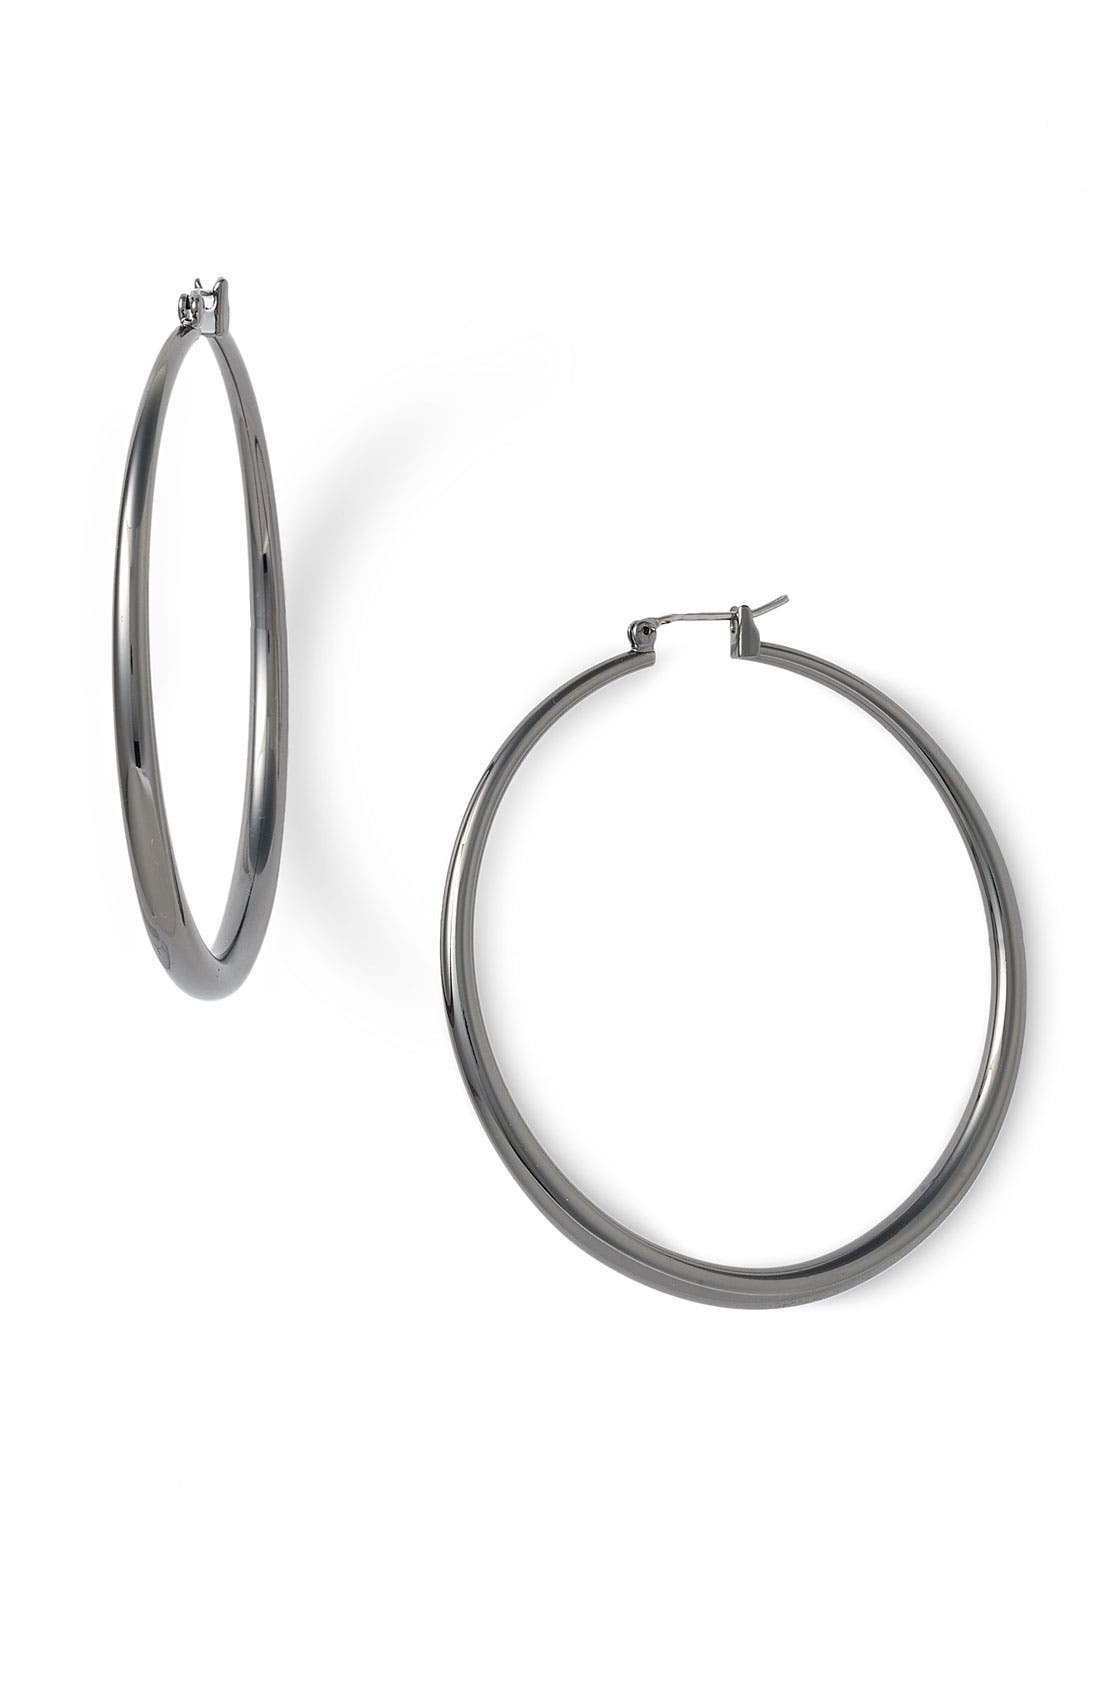 NORDSTROM, Thick Medium Hoop Earrings, Main thumbnail 1, color, 001